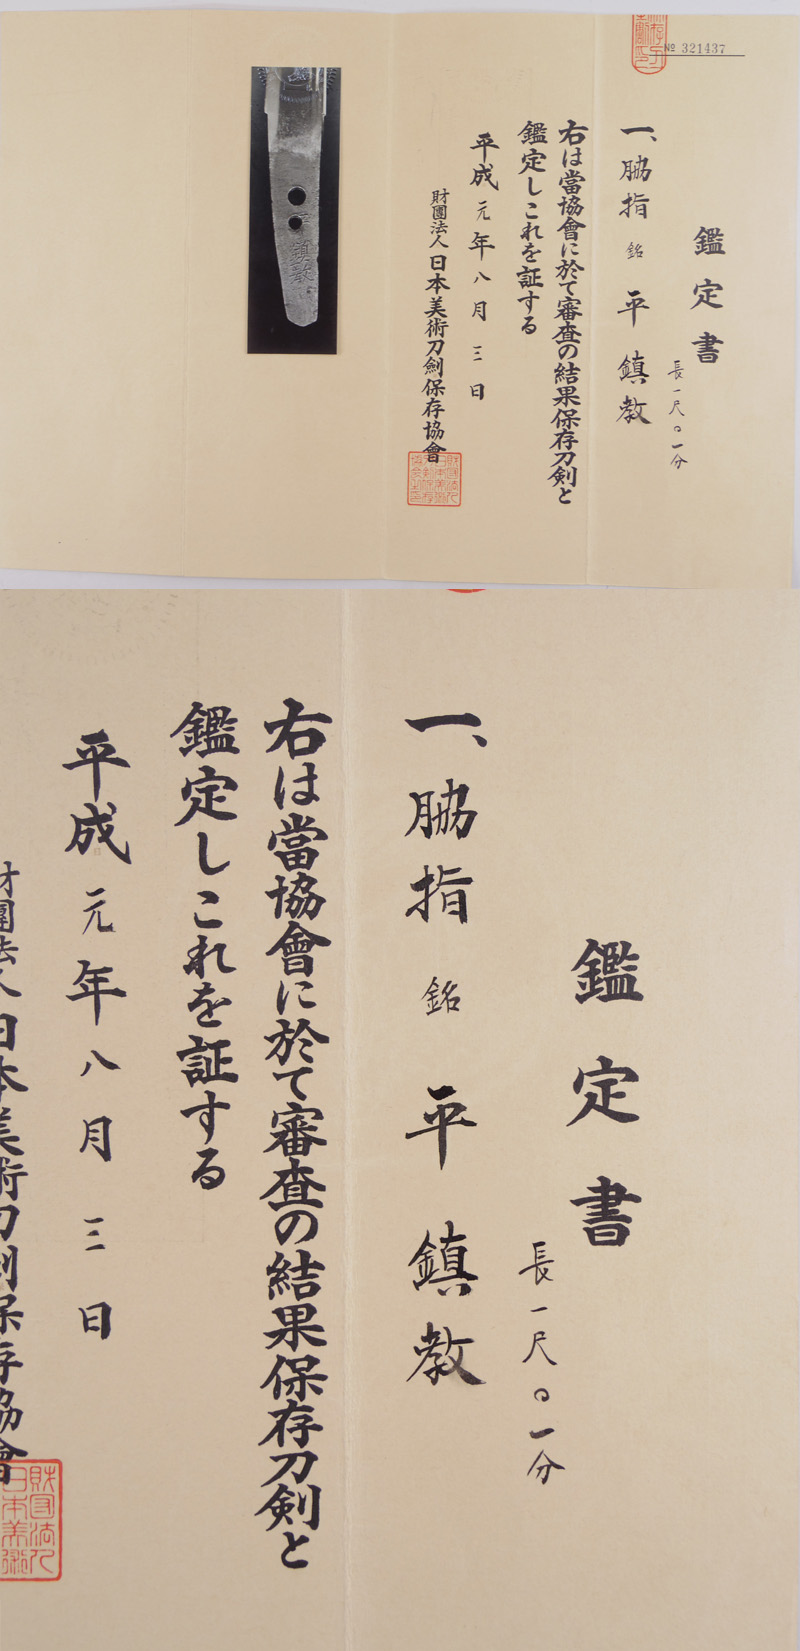 脇差 平 鎮教 (平高田) Picture of Certificate